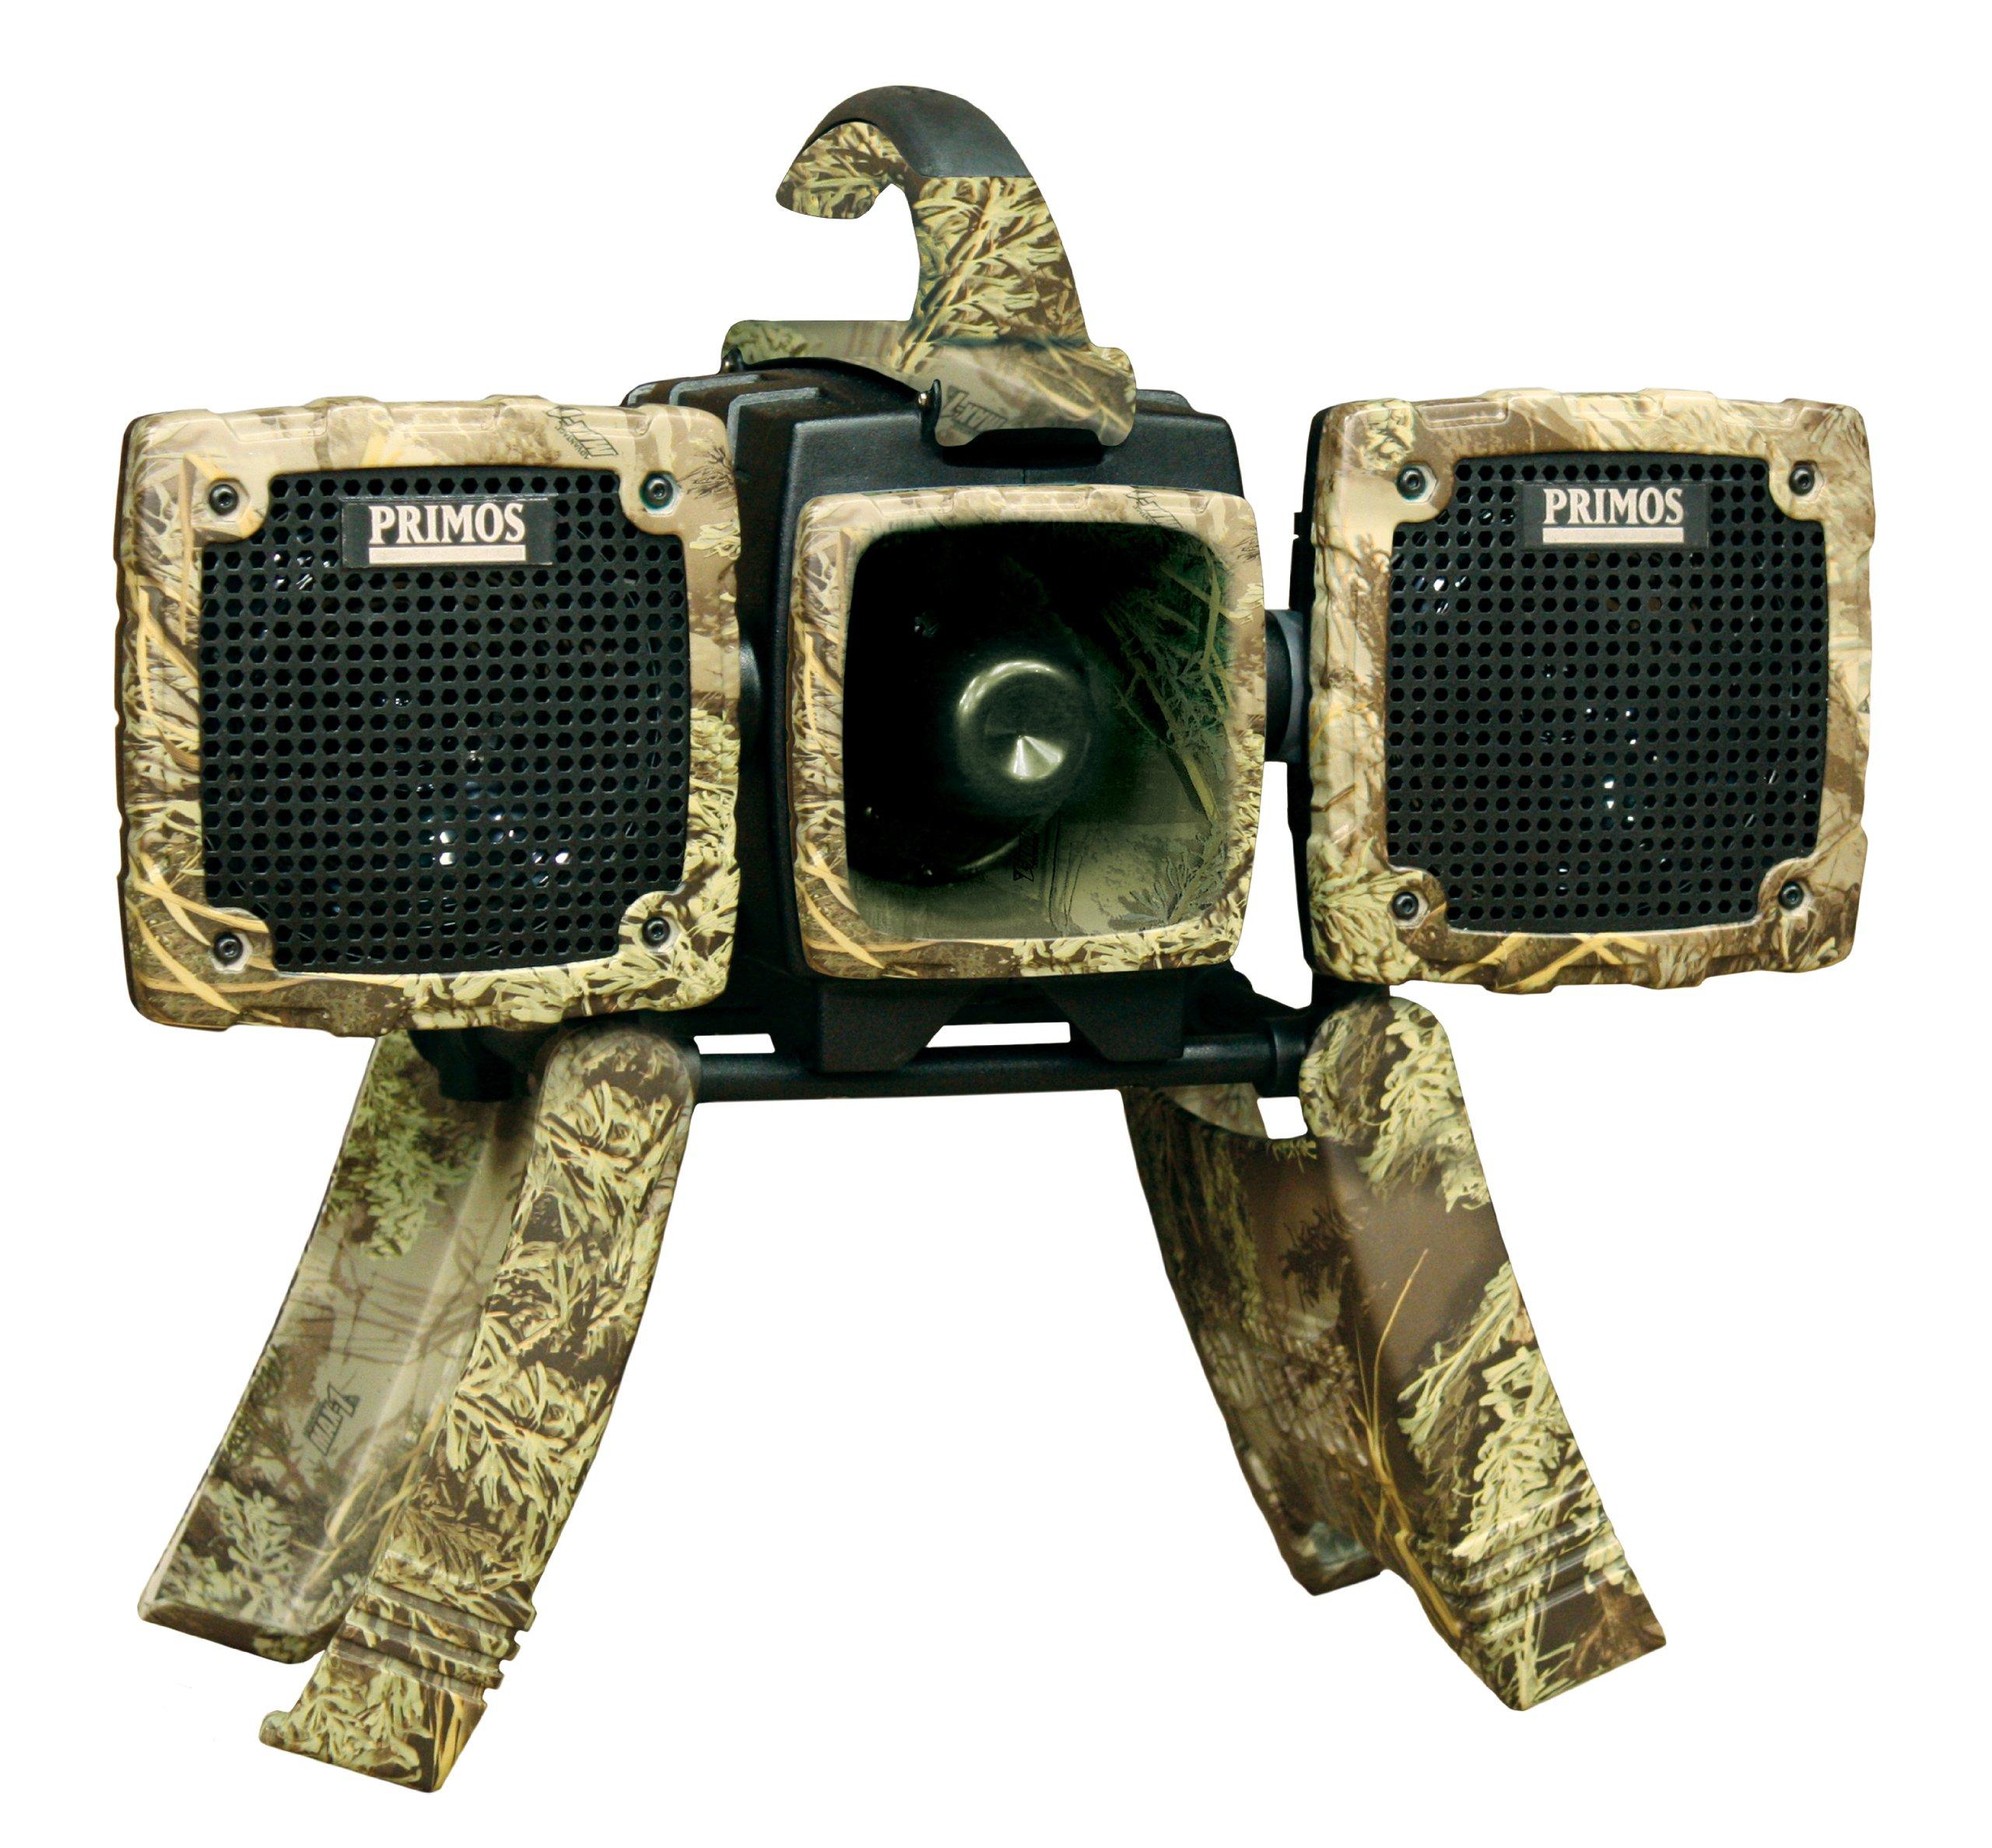 Primos Hunting 3756 Alpha Dogg Electronic Predator Call by Primos Hunting